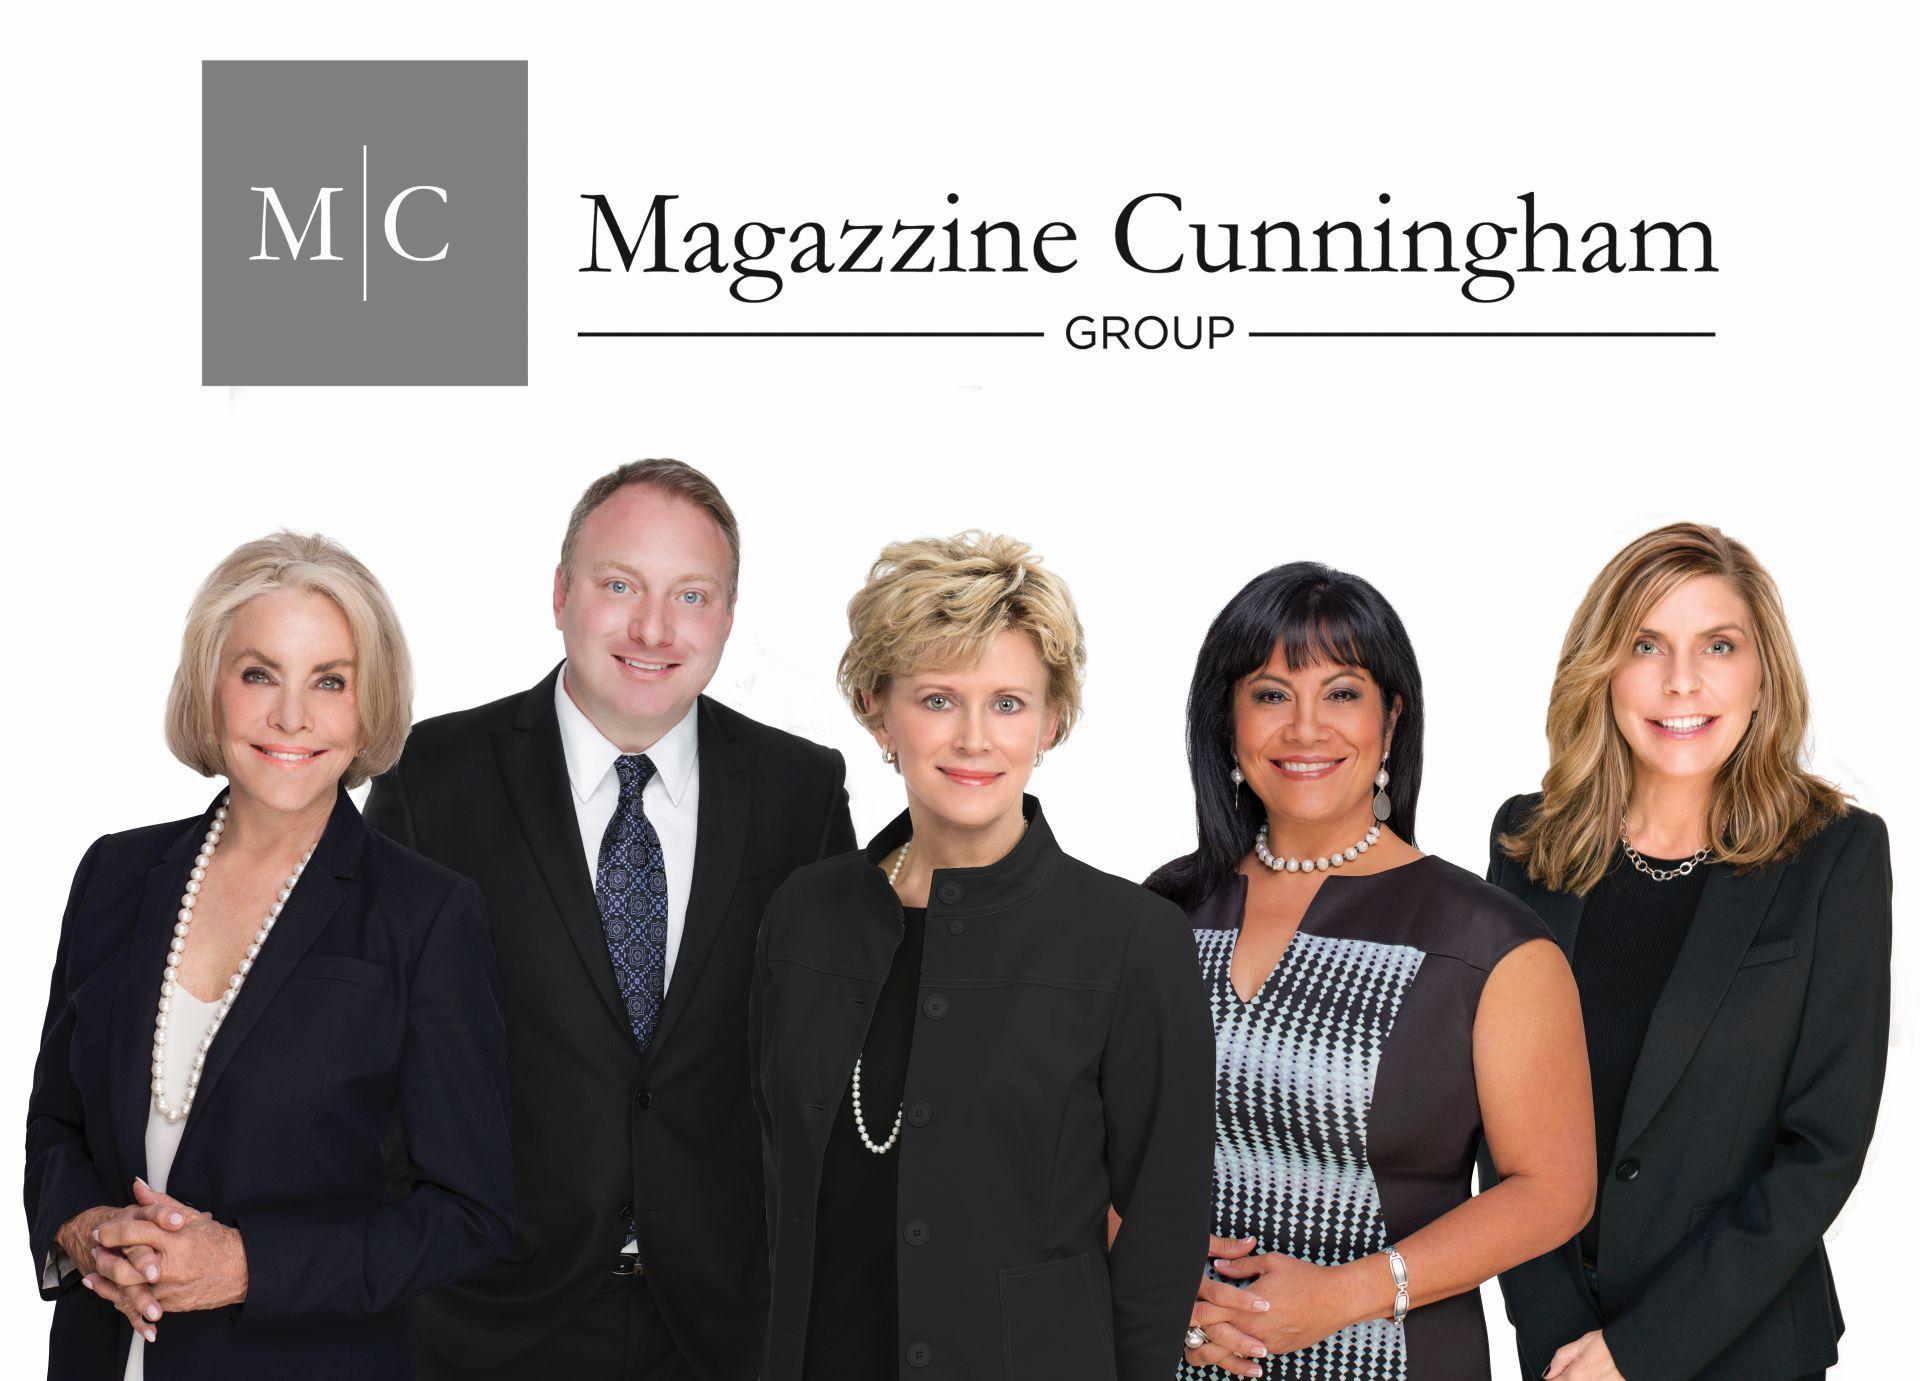 Magazzine Cunningham Group